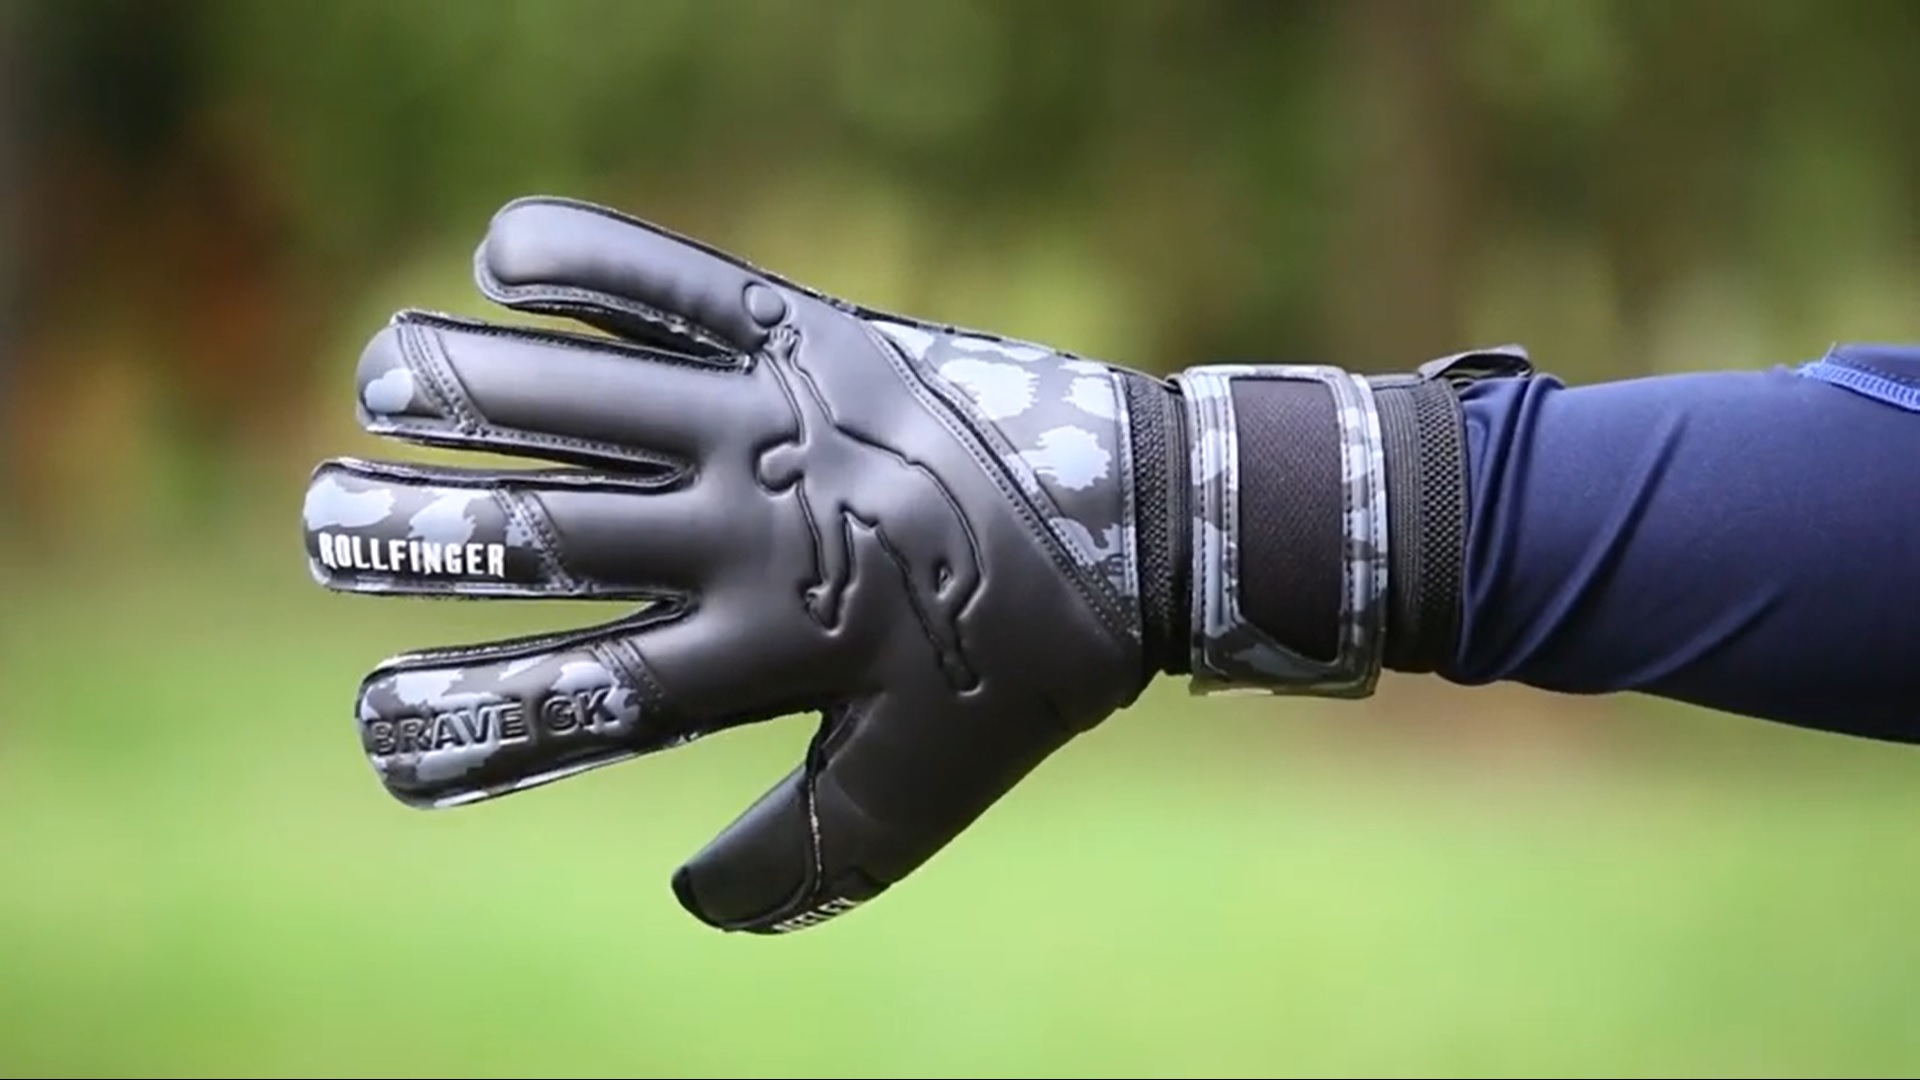 Brave GK Rollfinger goalkeeper gloves-official online shop Brave GK